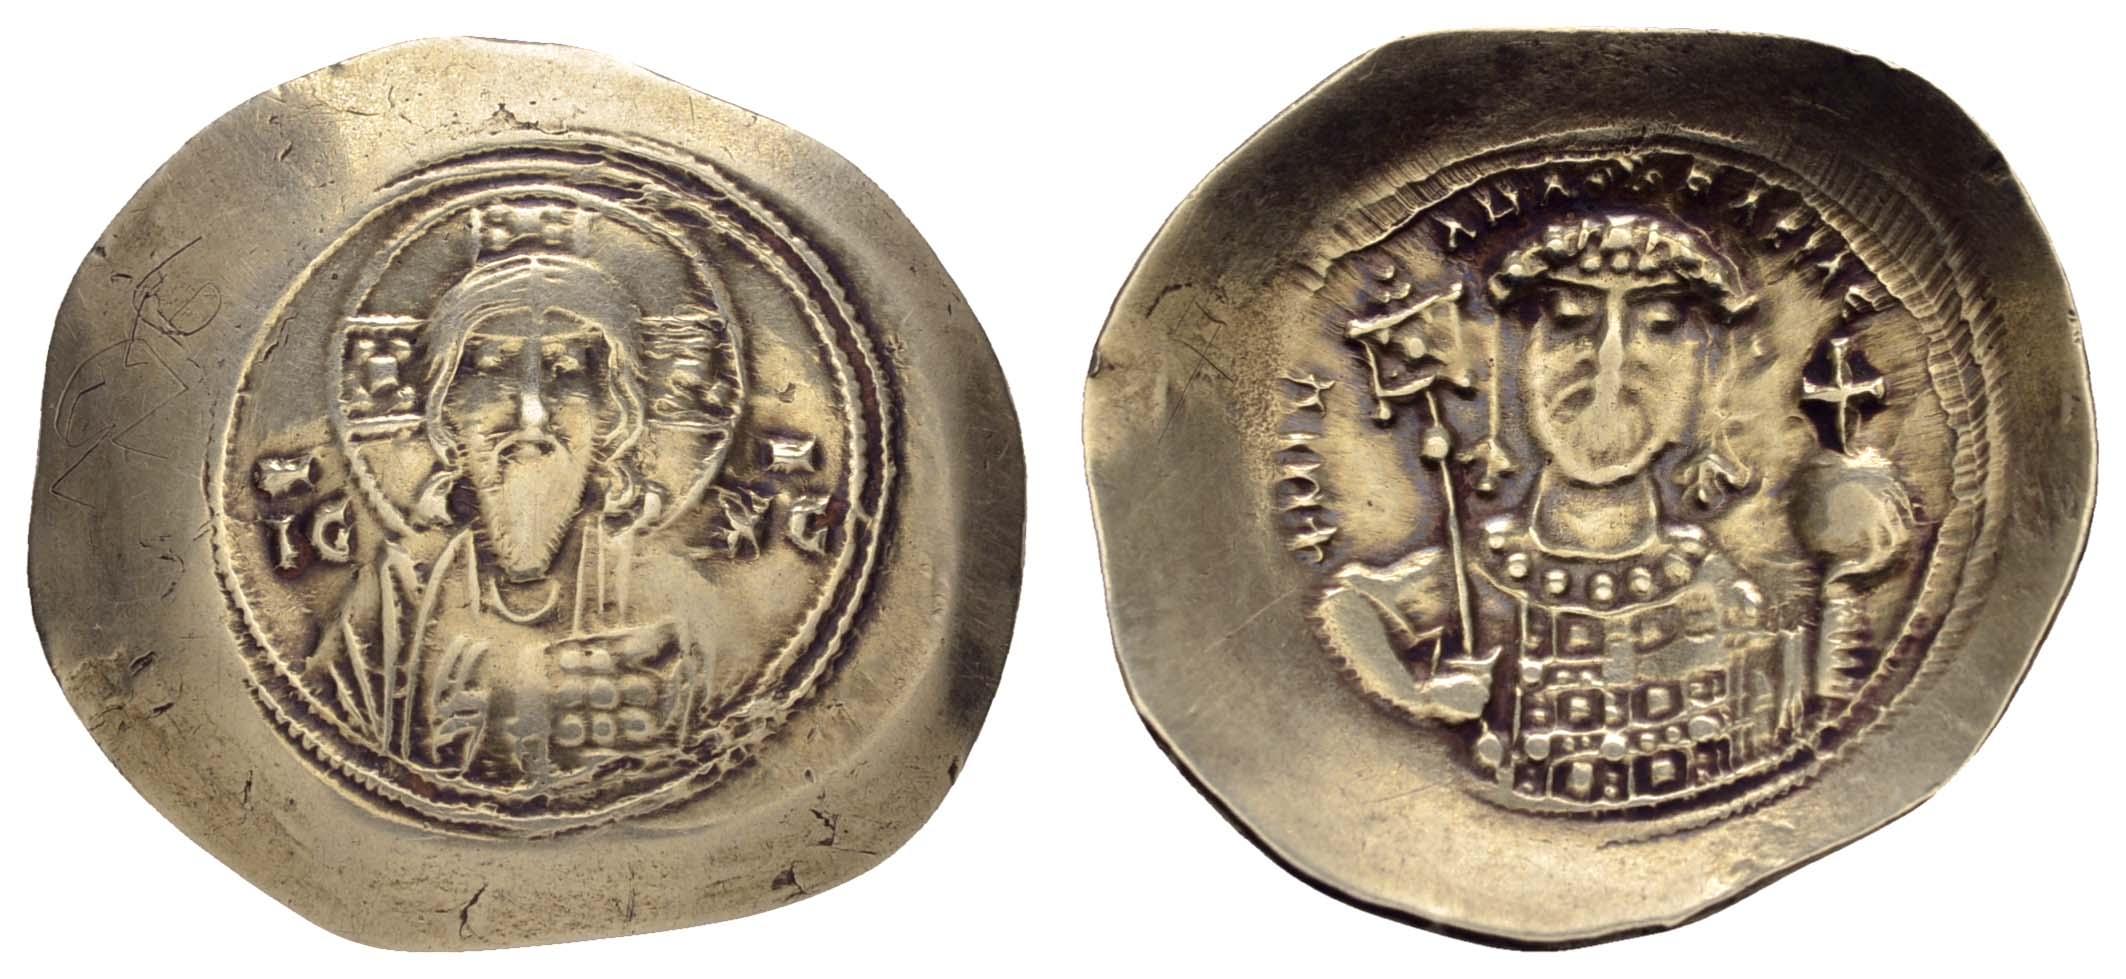 Lot 372 - Antike Byzanz -  Auktionshaus Ulrich Felzmann GmbH & Co. KG Coins single lots